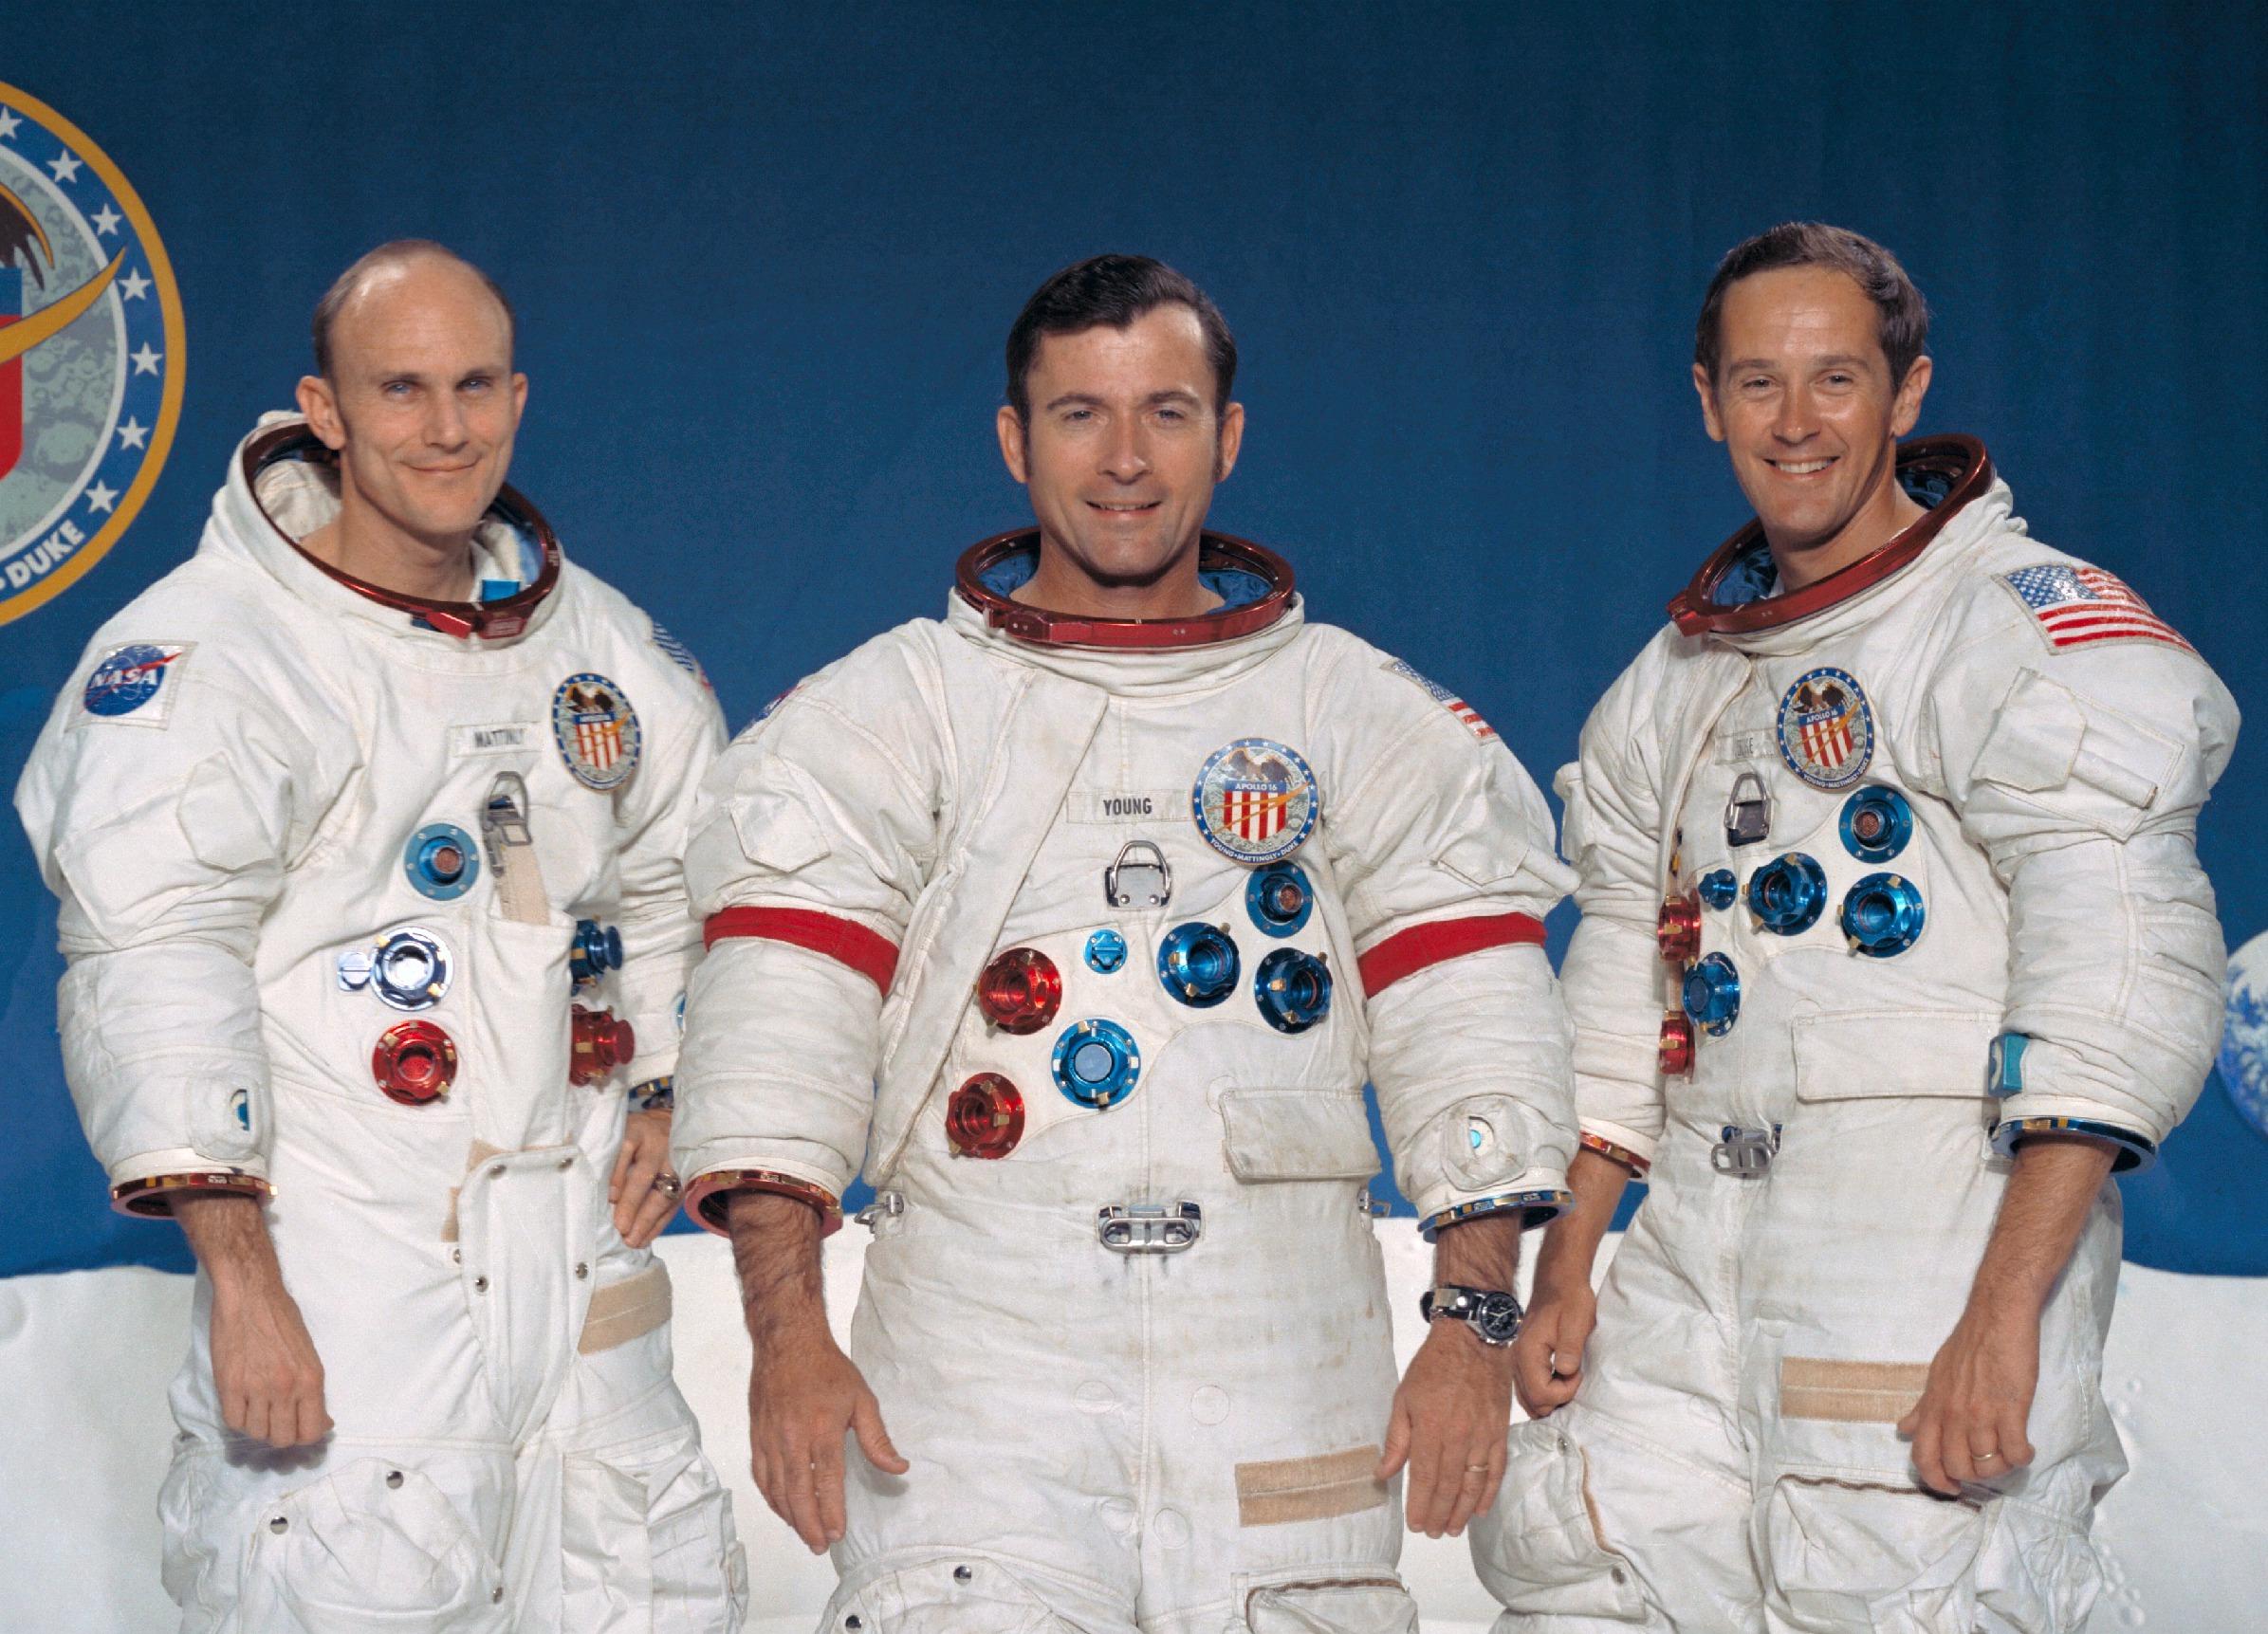 Apollo 16 crew: Thomas Mattingly, John Young & Charles Duke (courtesy of NASA)